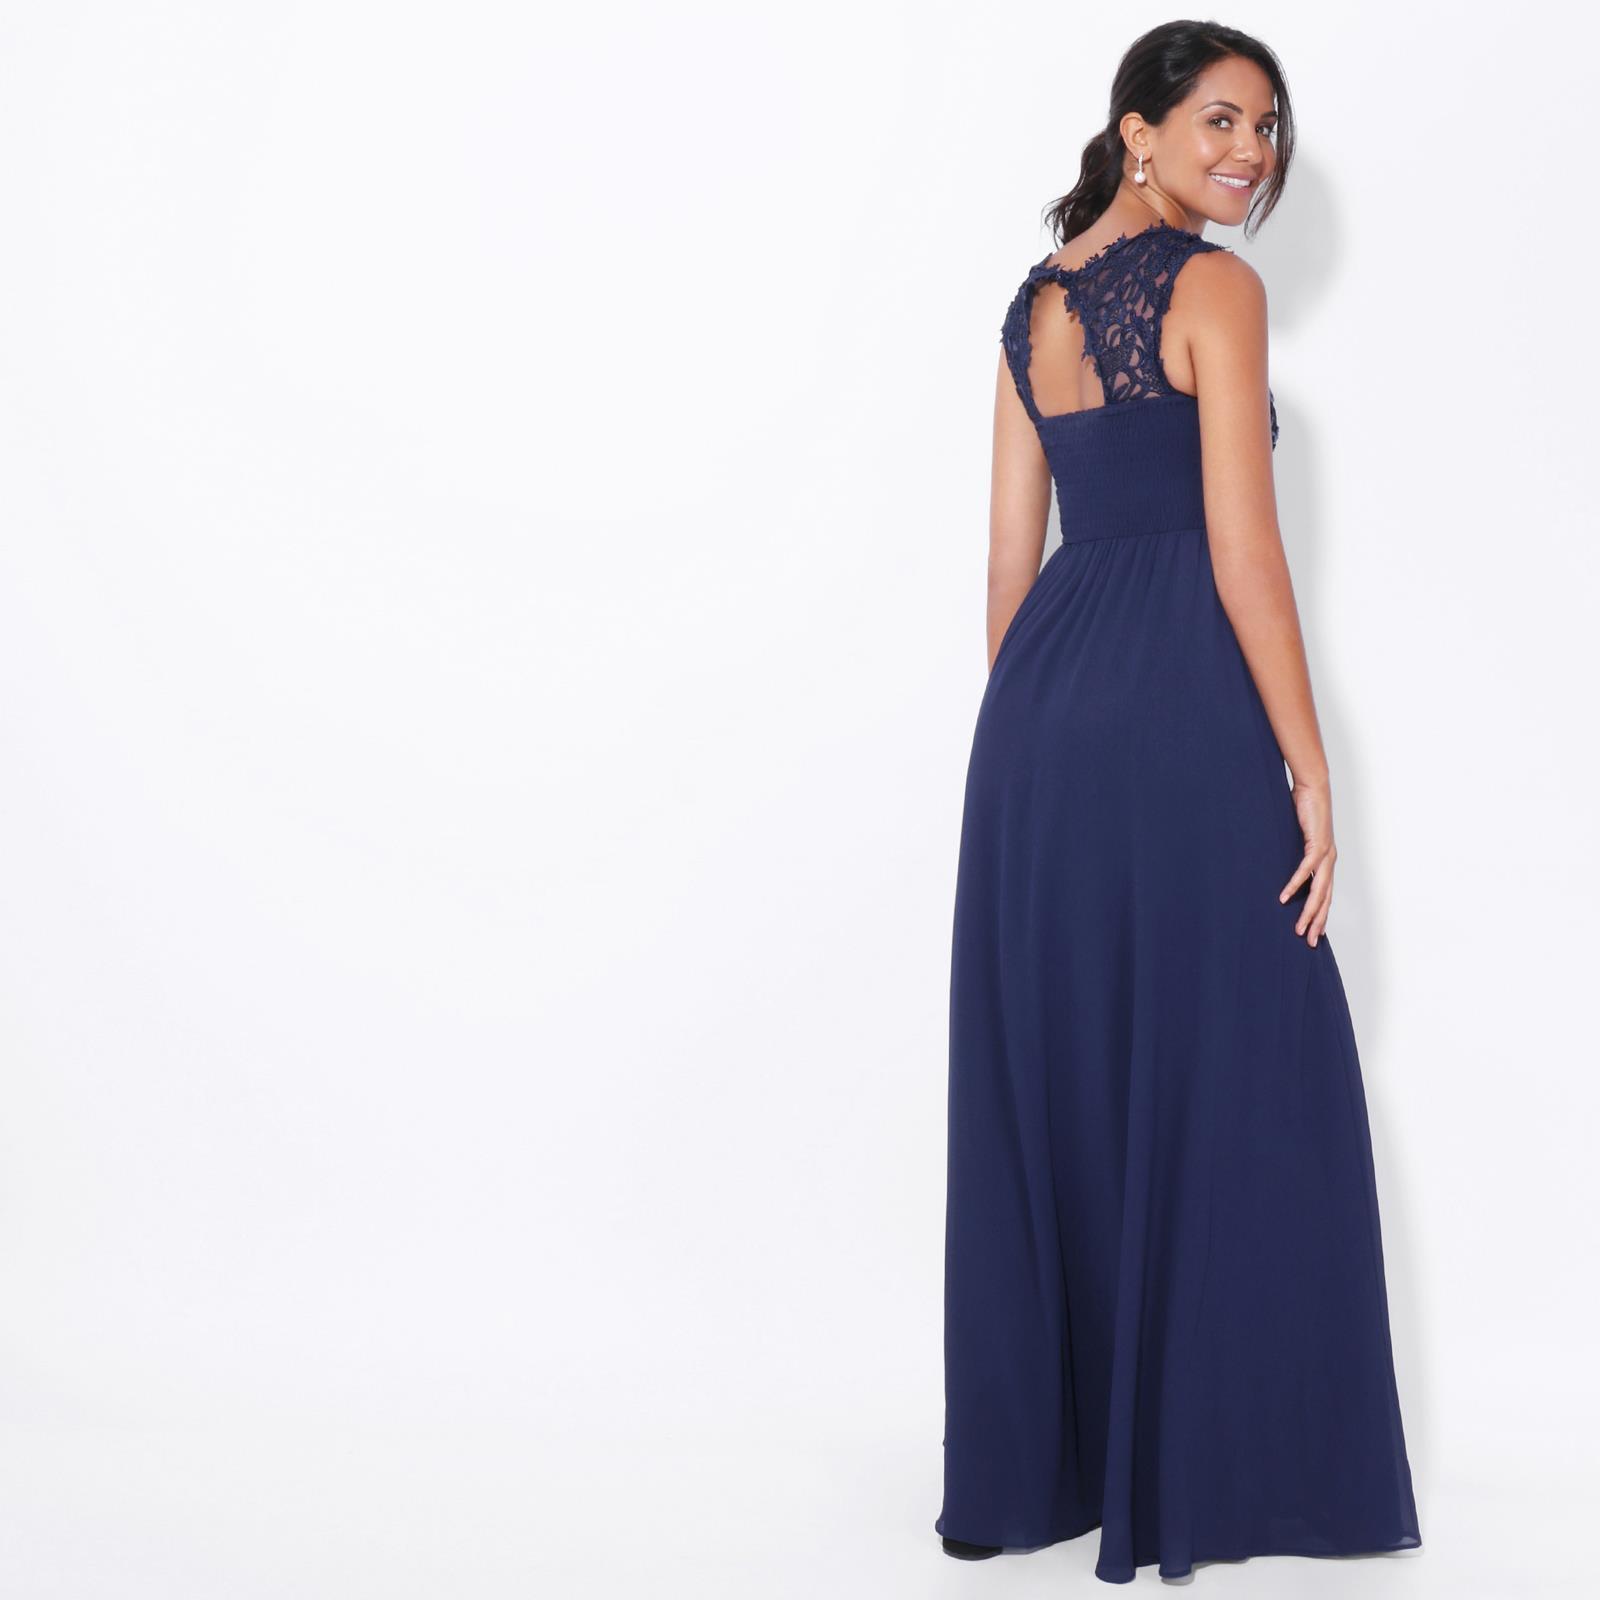 Womens-Wedding-Bridesmaid-Prom-Dress-Formal-One-Off-Shoulder-Long-Evening-8-18 thumbnail 41